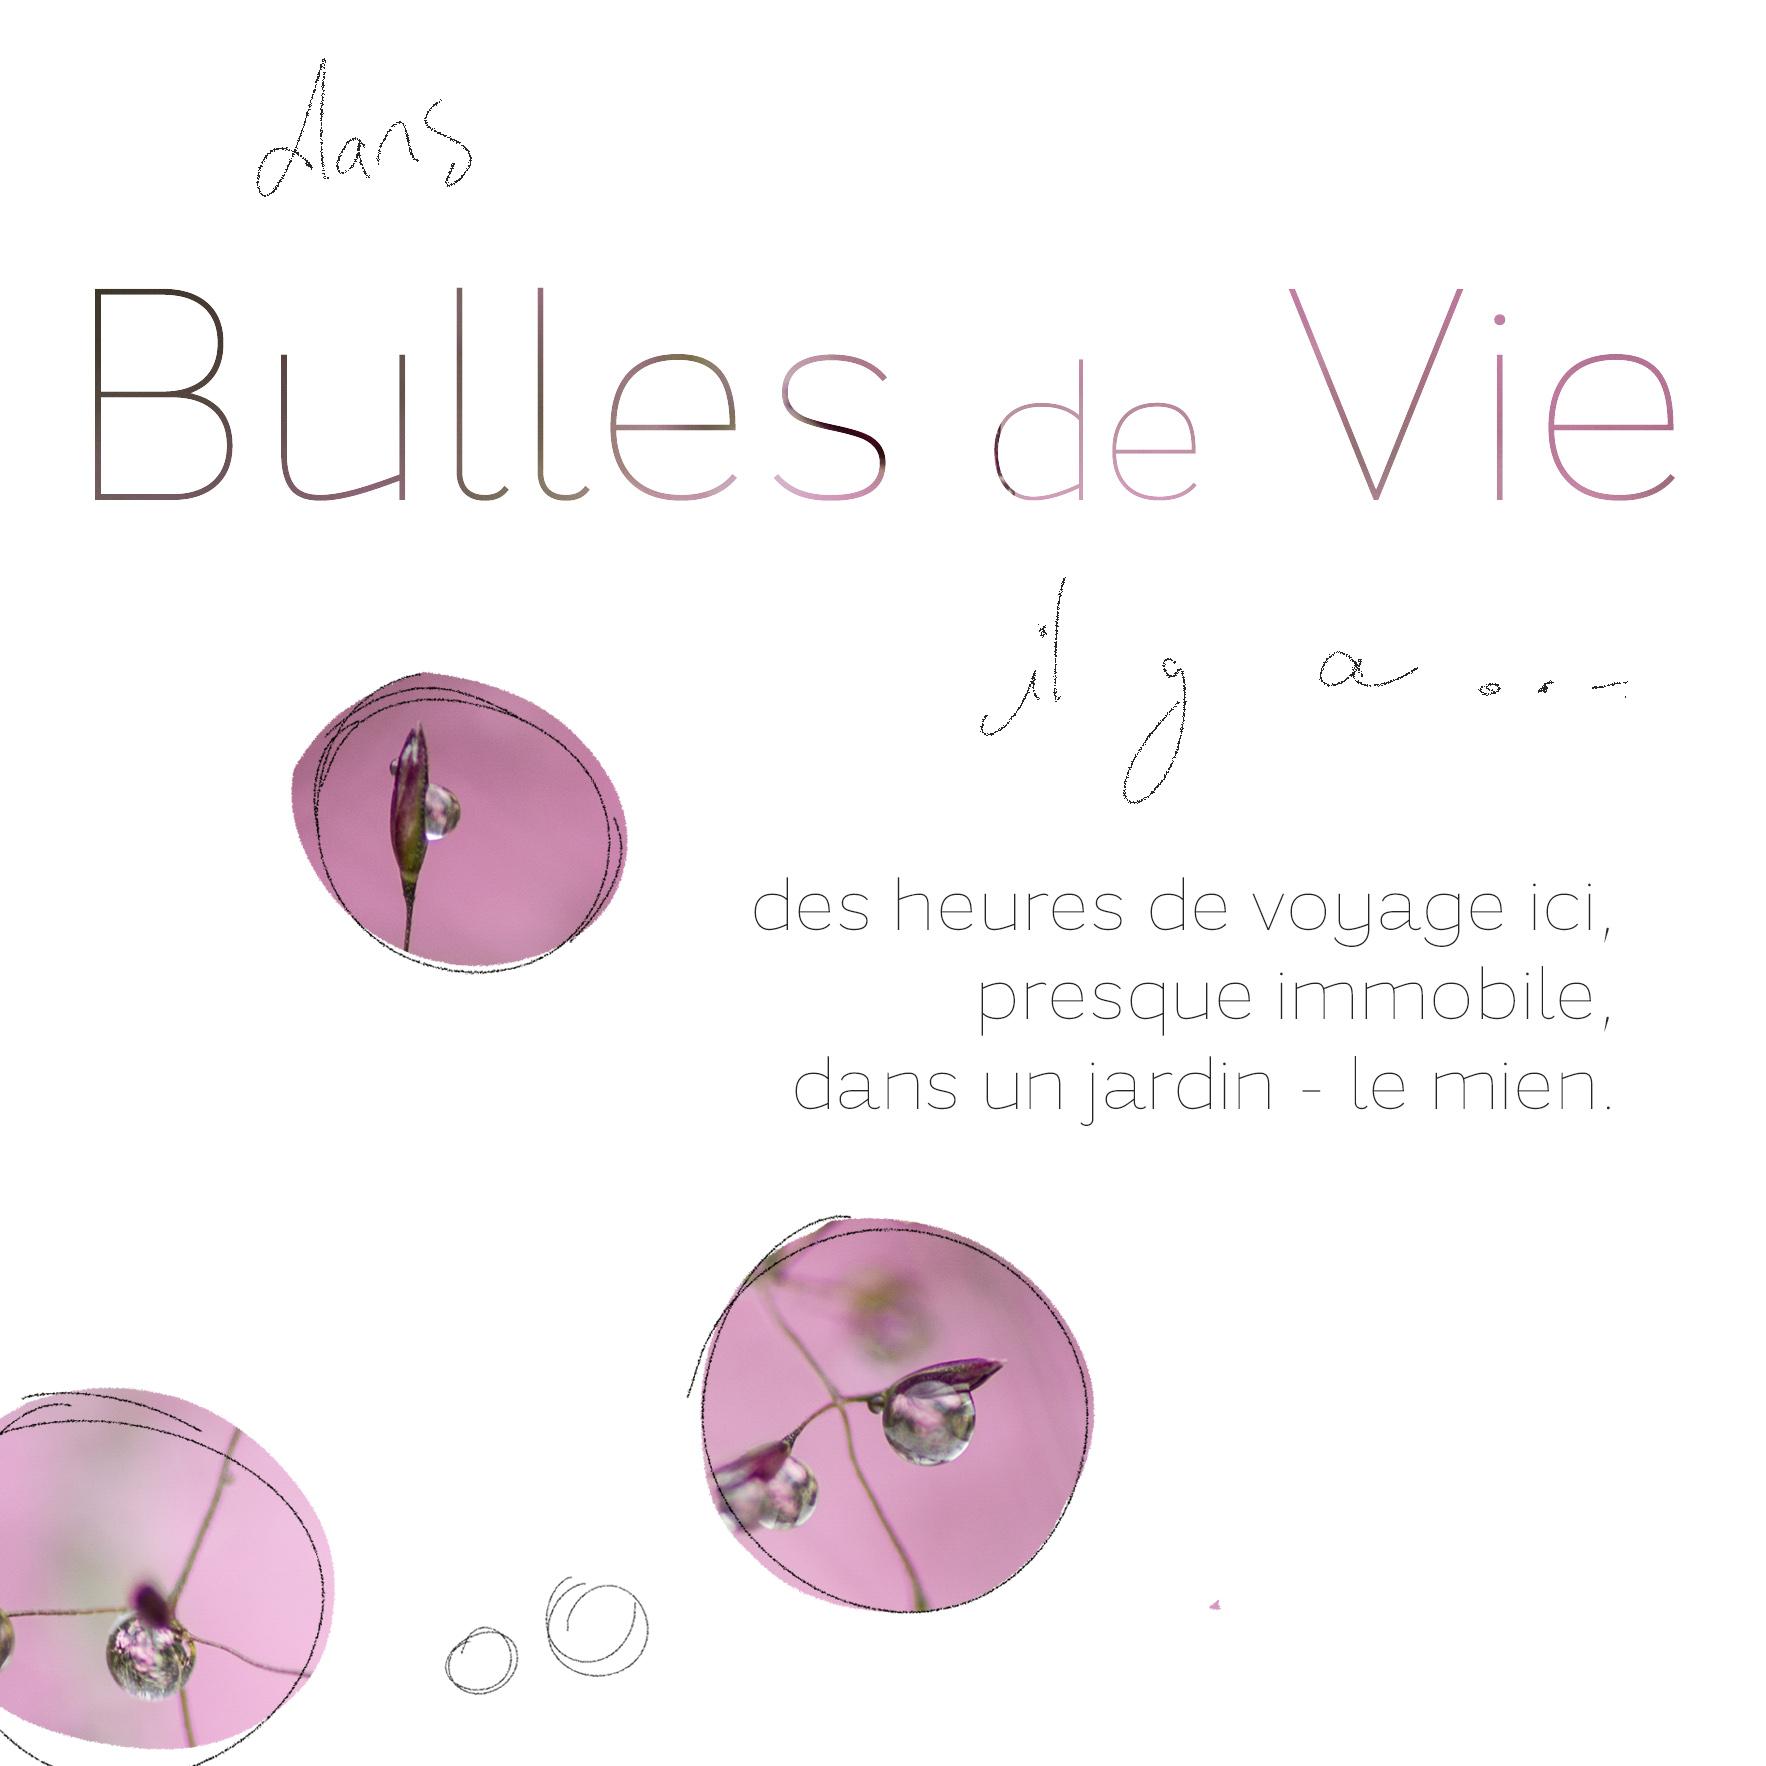 bulles de vie @johannegicquel